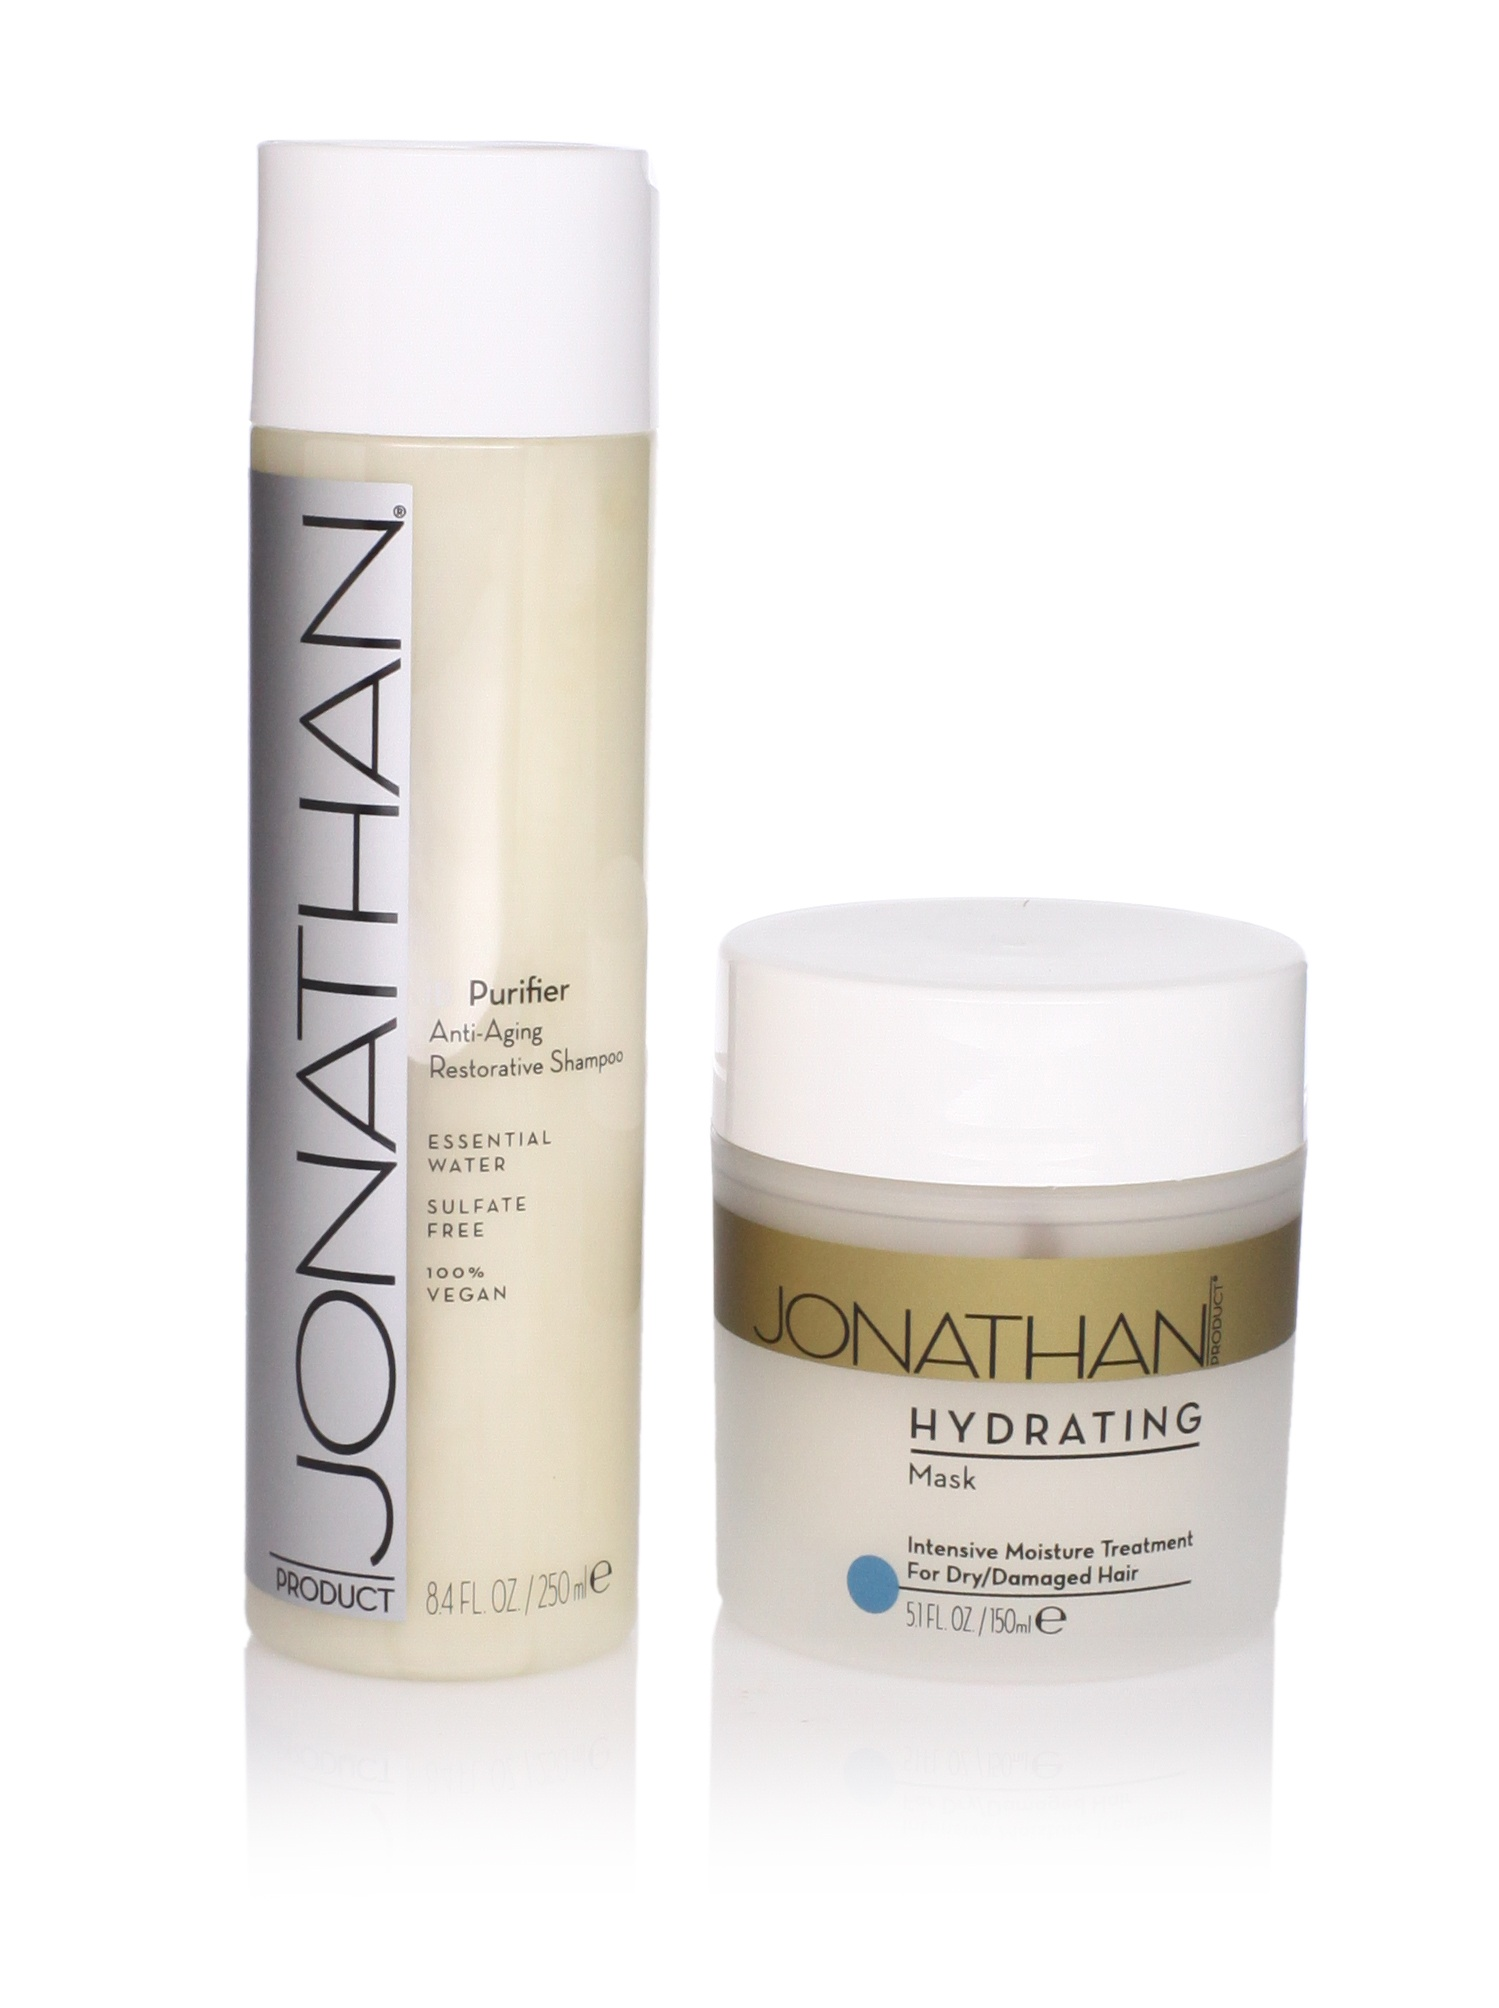 Jonathan Product Ib Purifier Shampoo and Hydrating Mask, 2 Pack